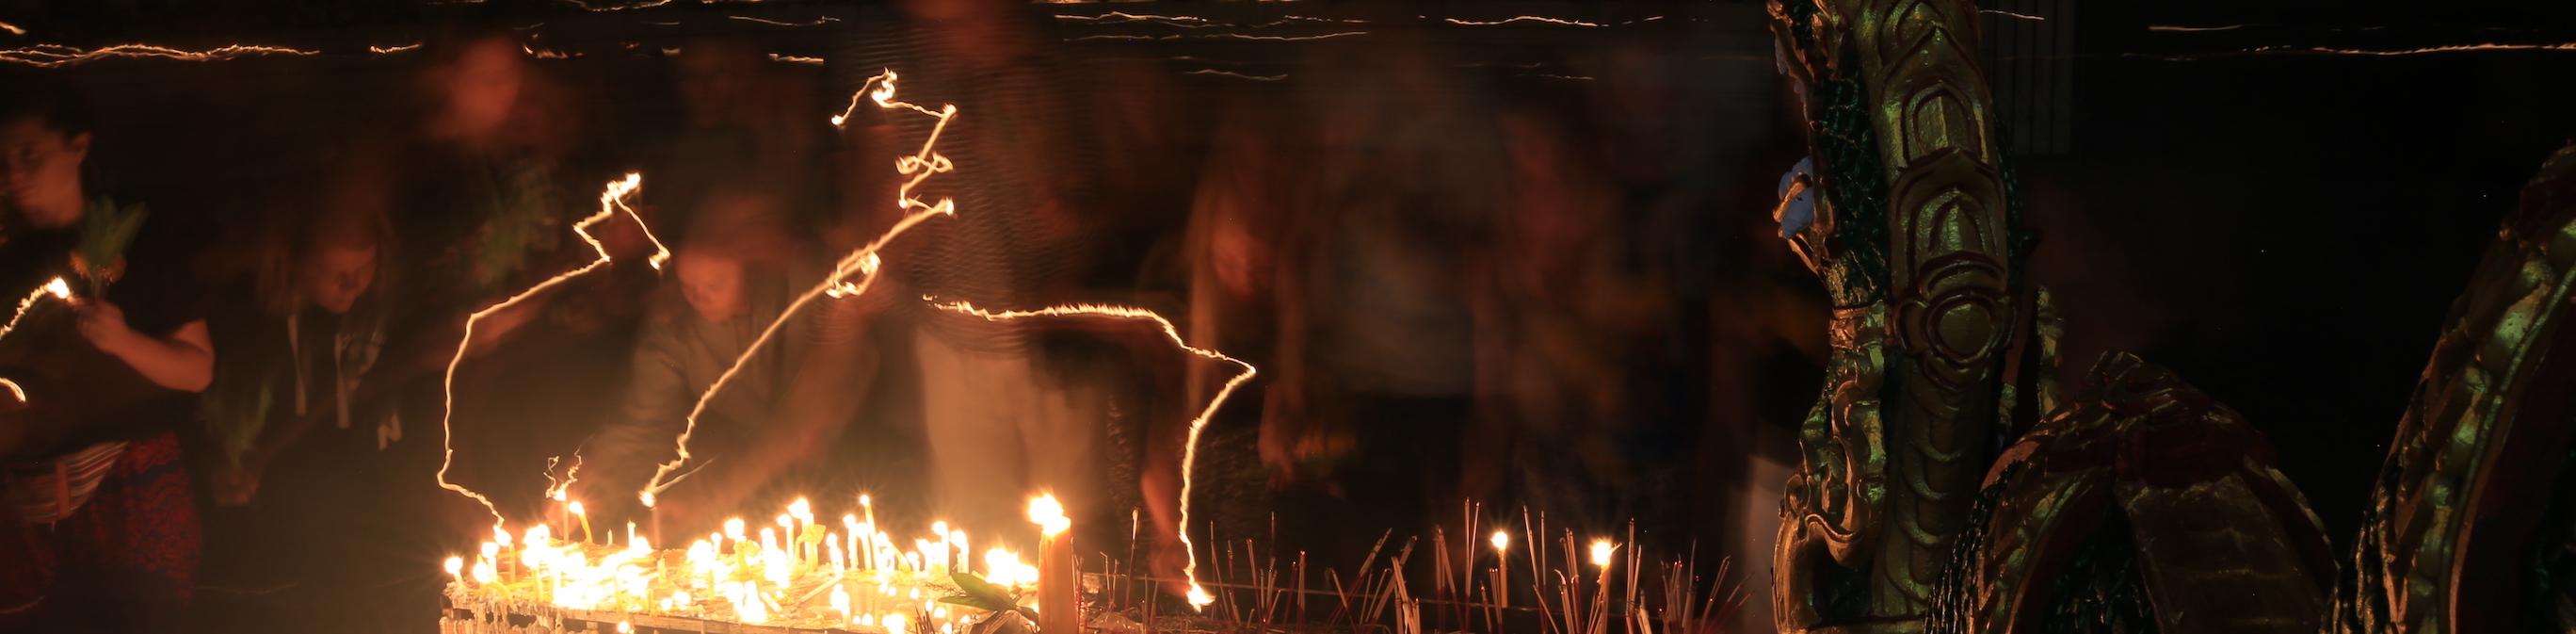 Buddhist Ceremony